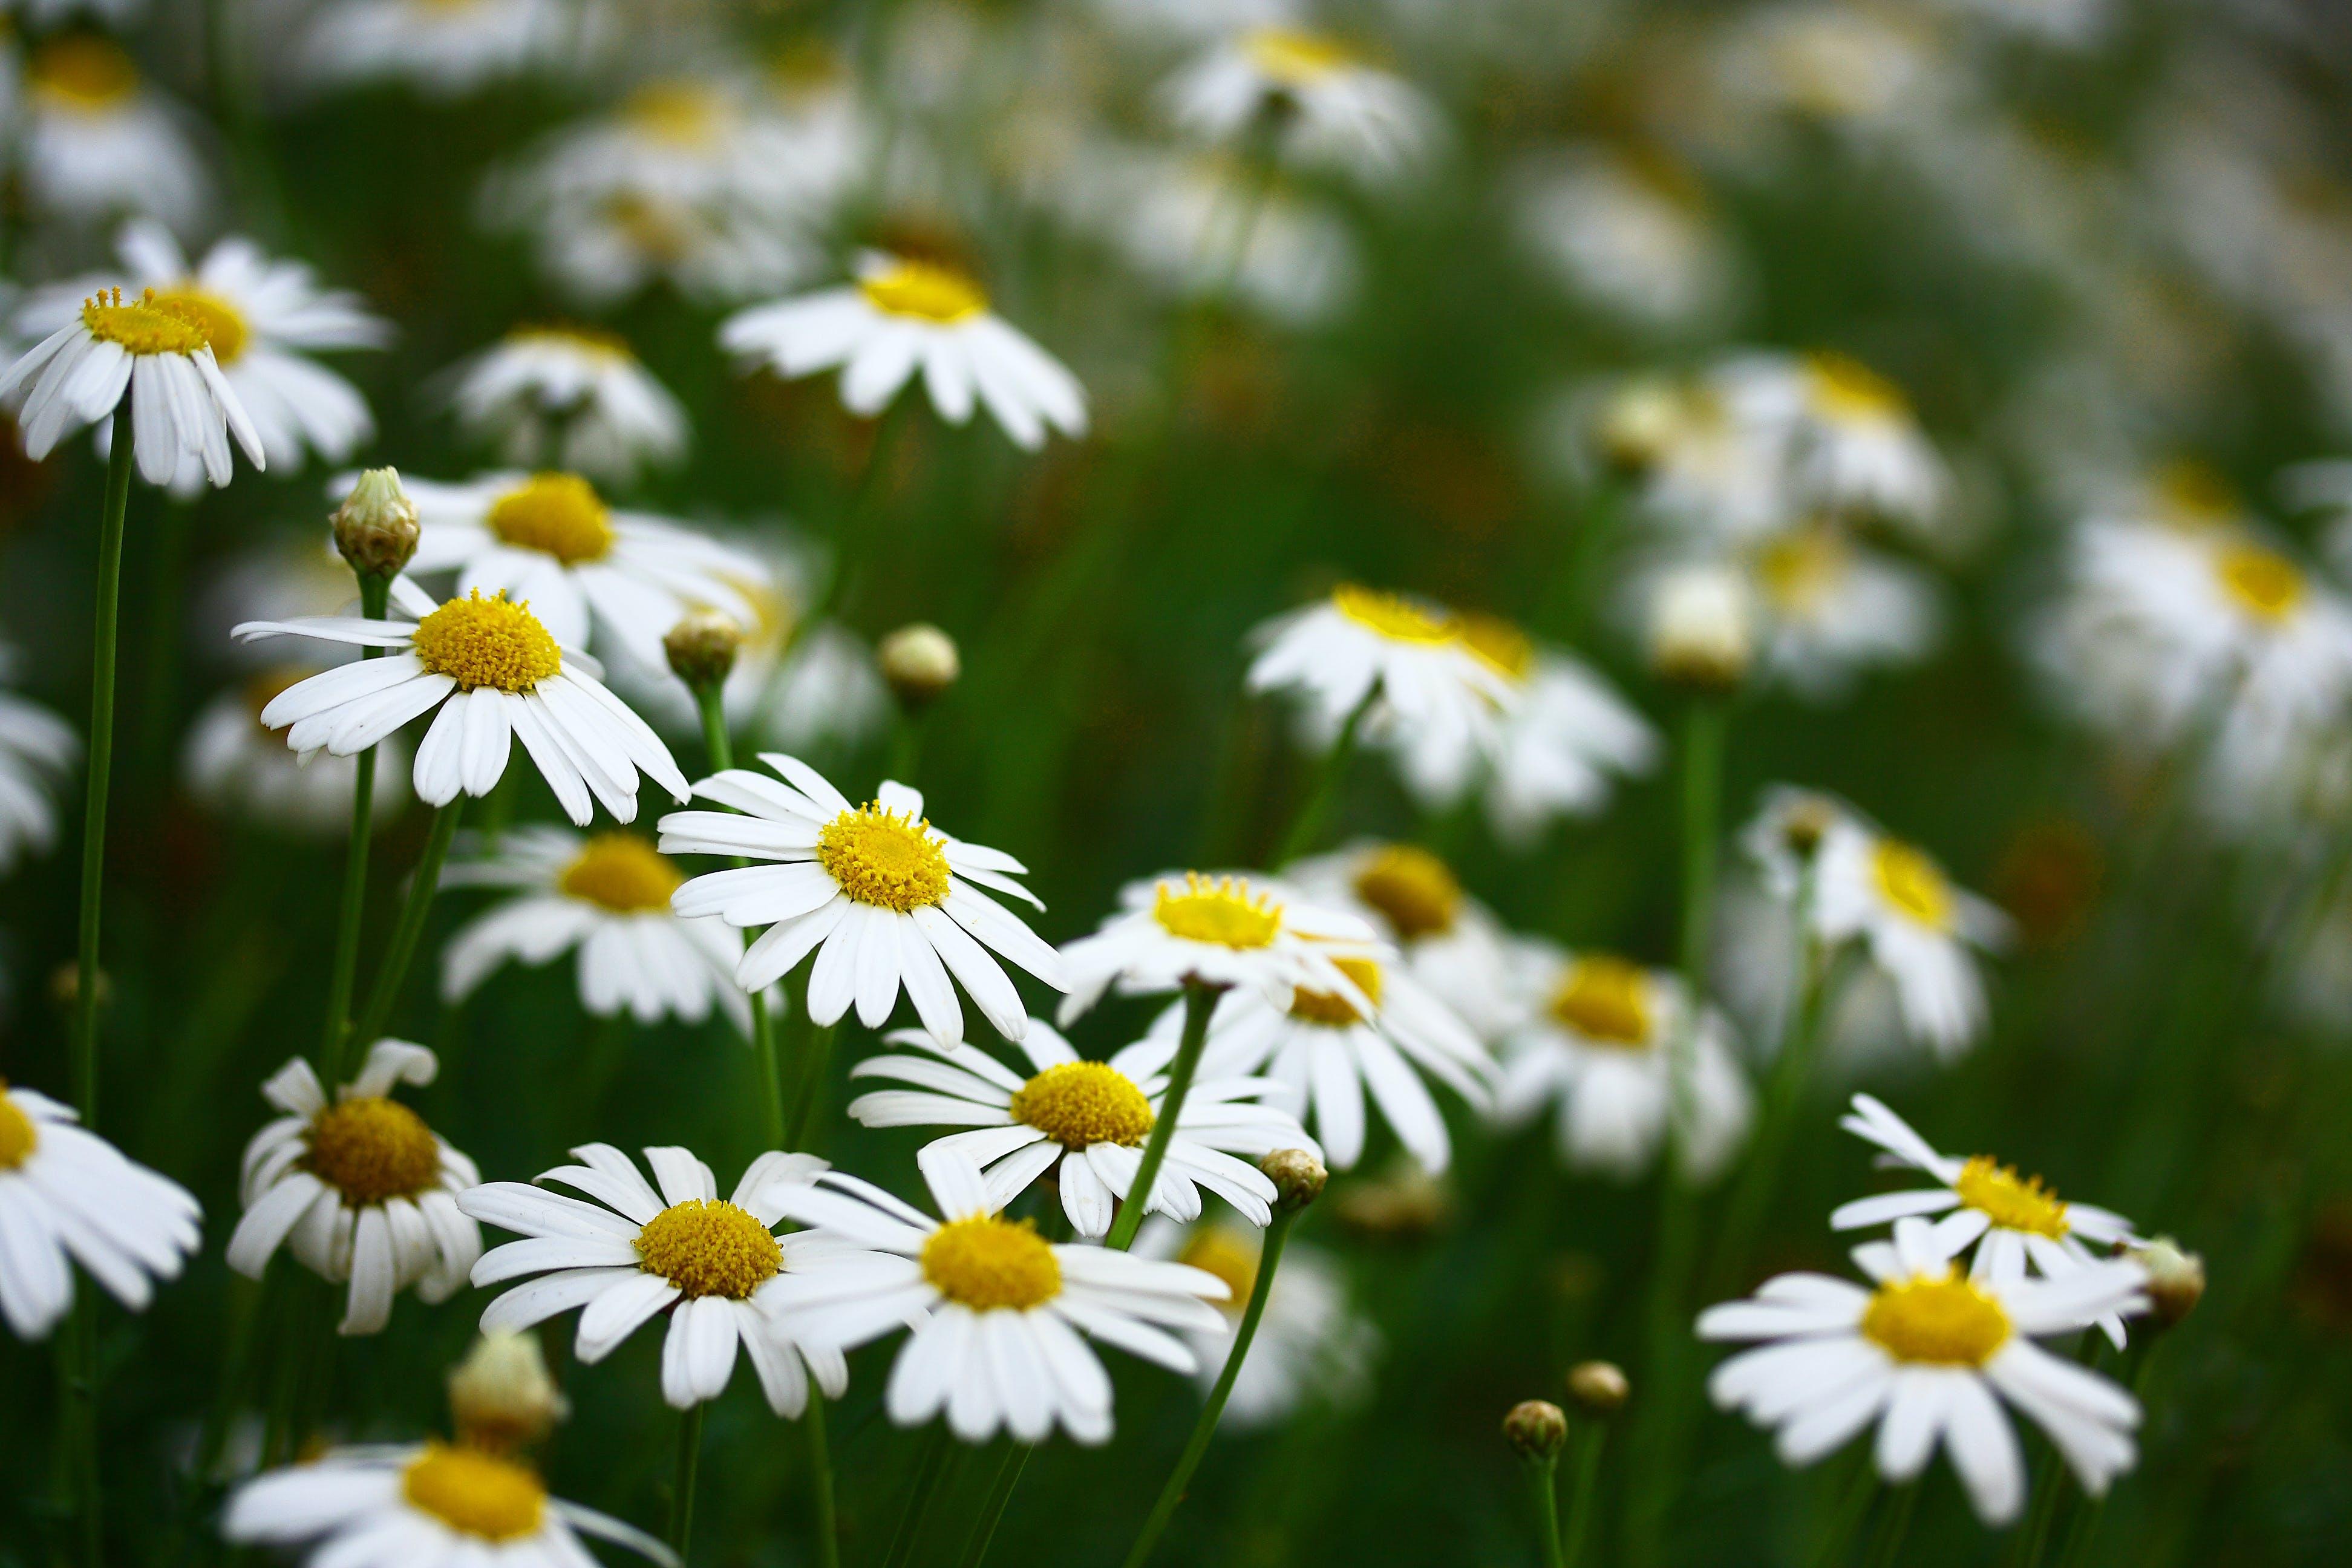 Close-Up Photo of Daisies